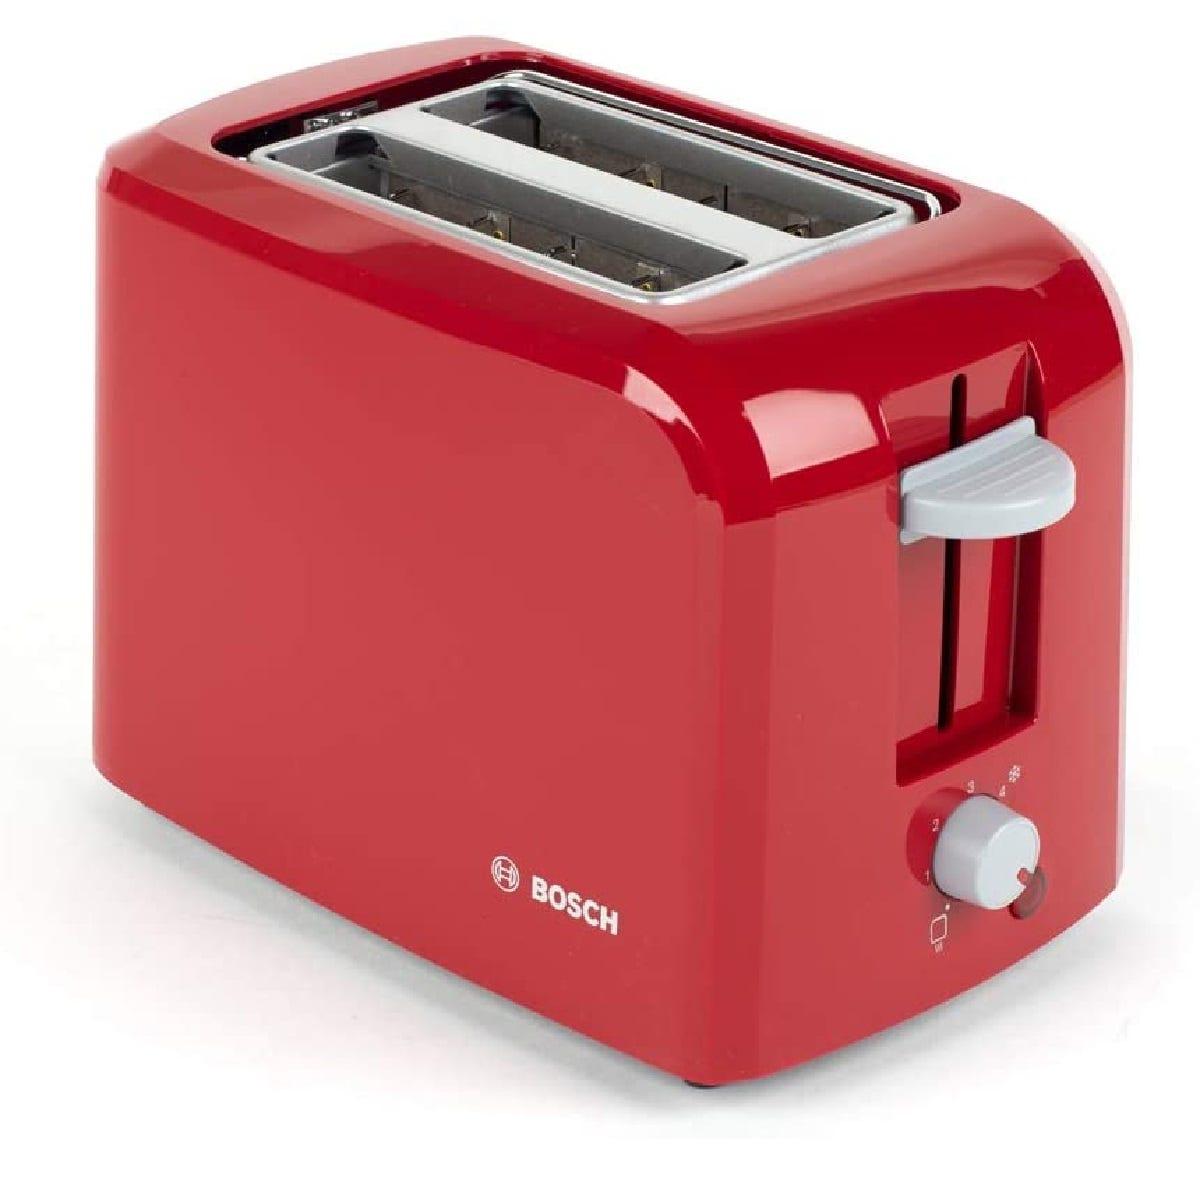 Bosch TAT3A014GB Village 2-Slice 980W Toaster - Red